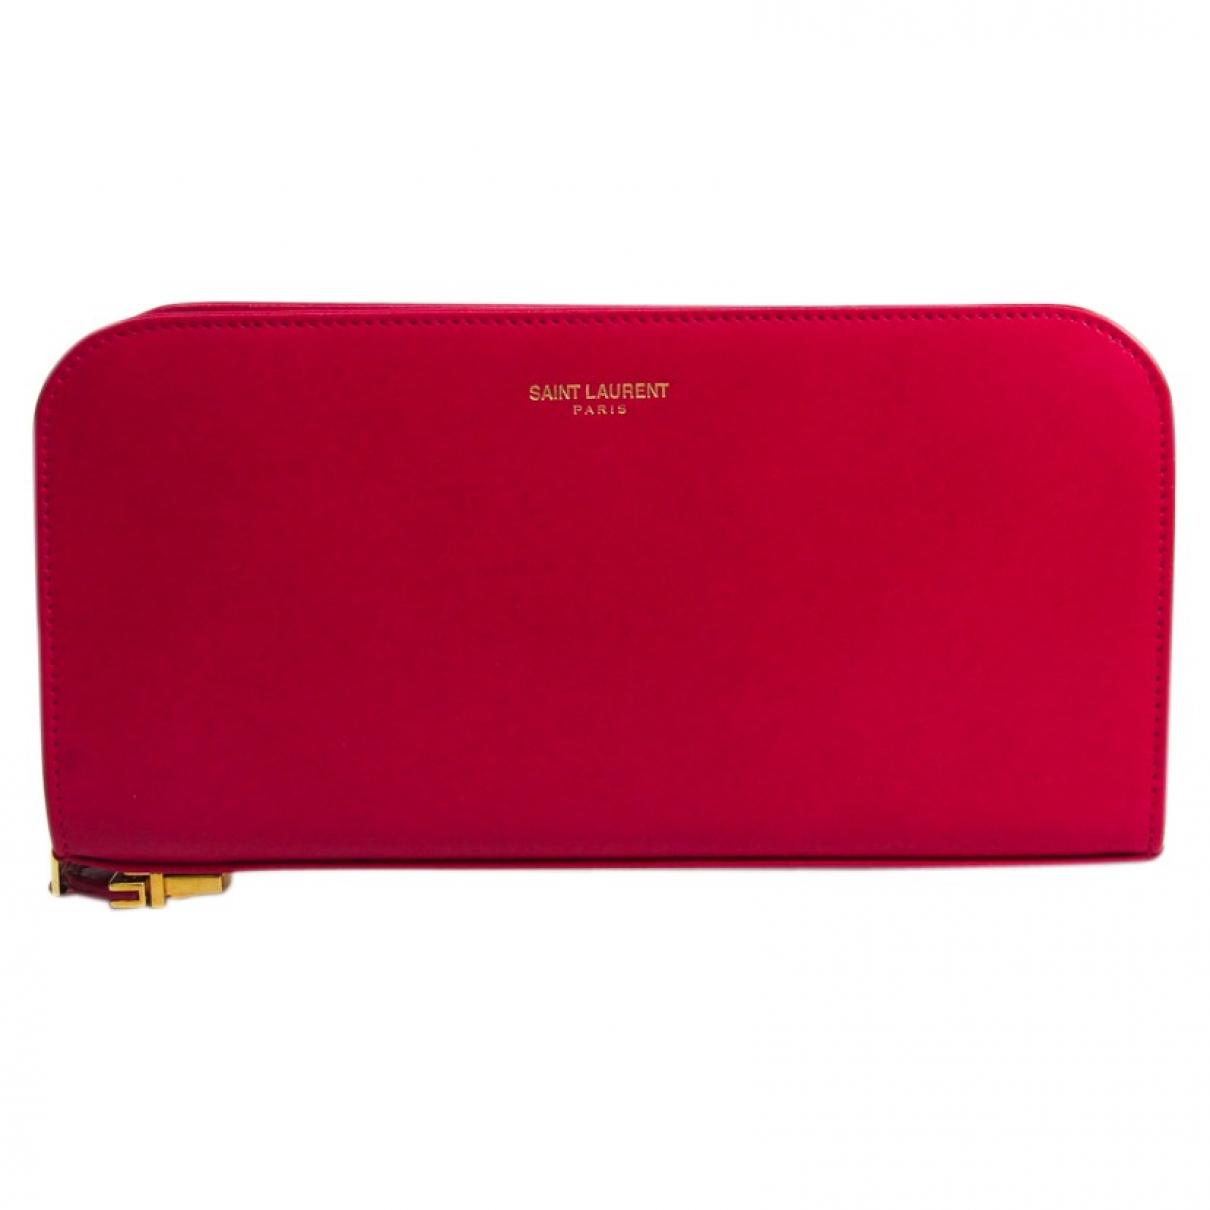 Saint Laurent N Pink Leather wallet for Women N